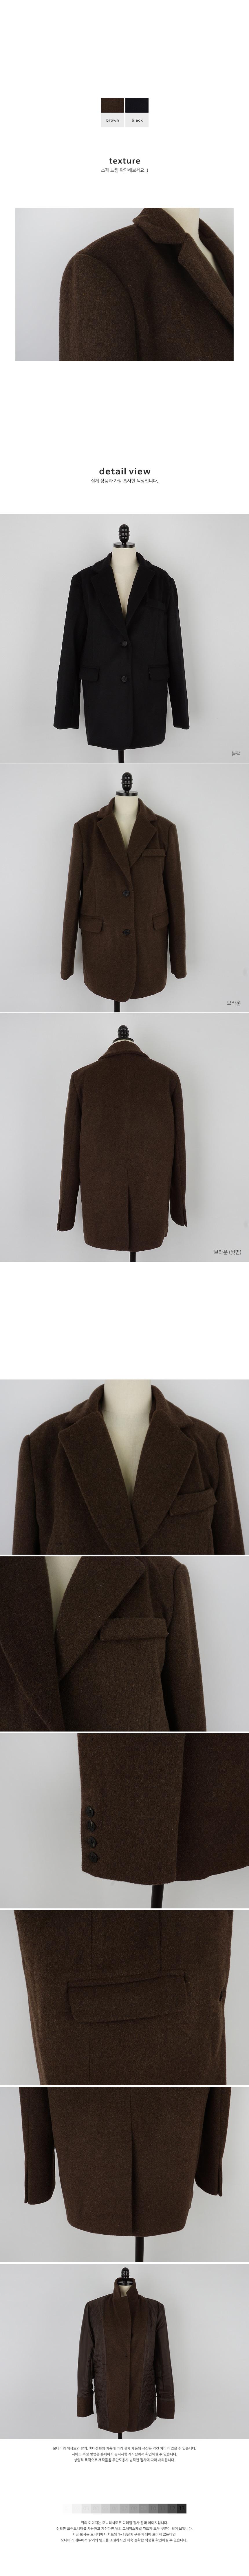 Melbourne Wool Jacket *3 oz Snoopy